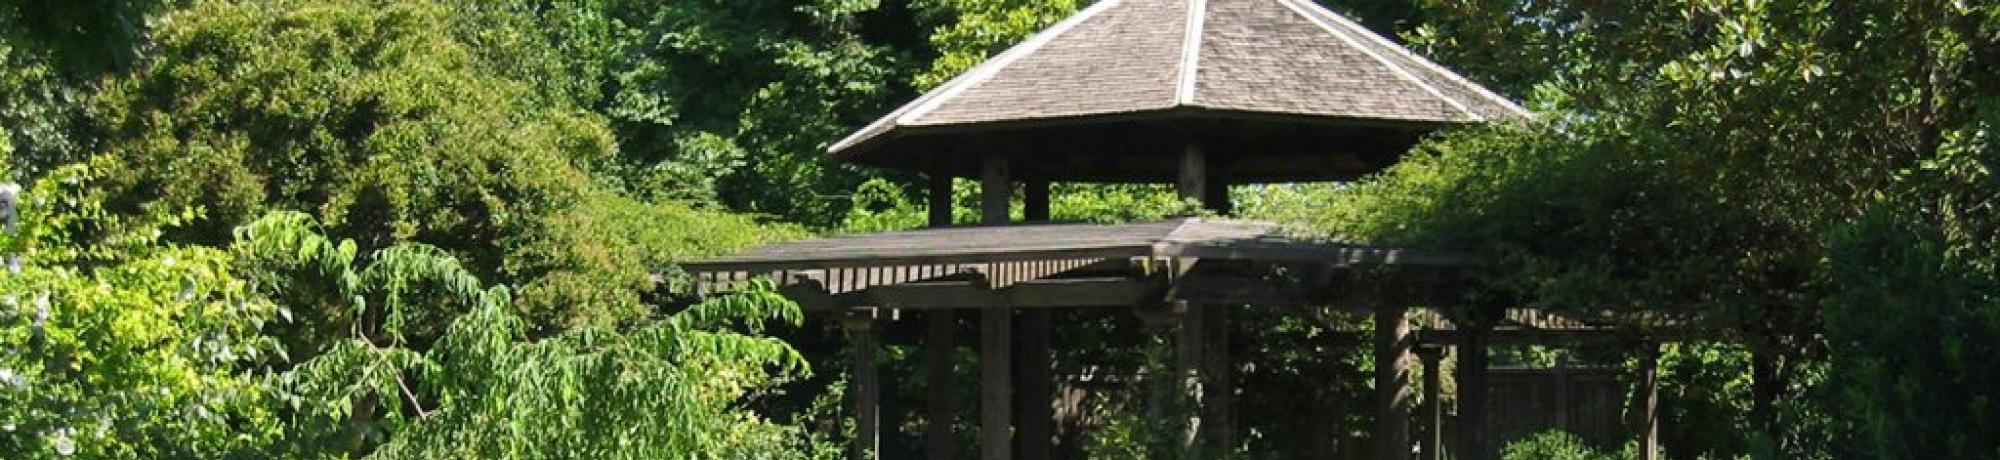 Carolee Shields White Flower Garden And Gazebo Uc Davis Arboretum